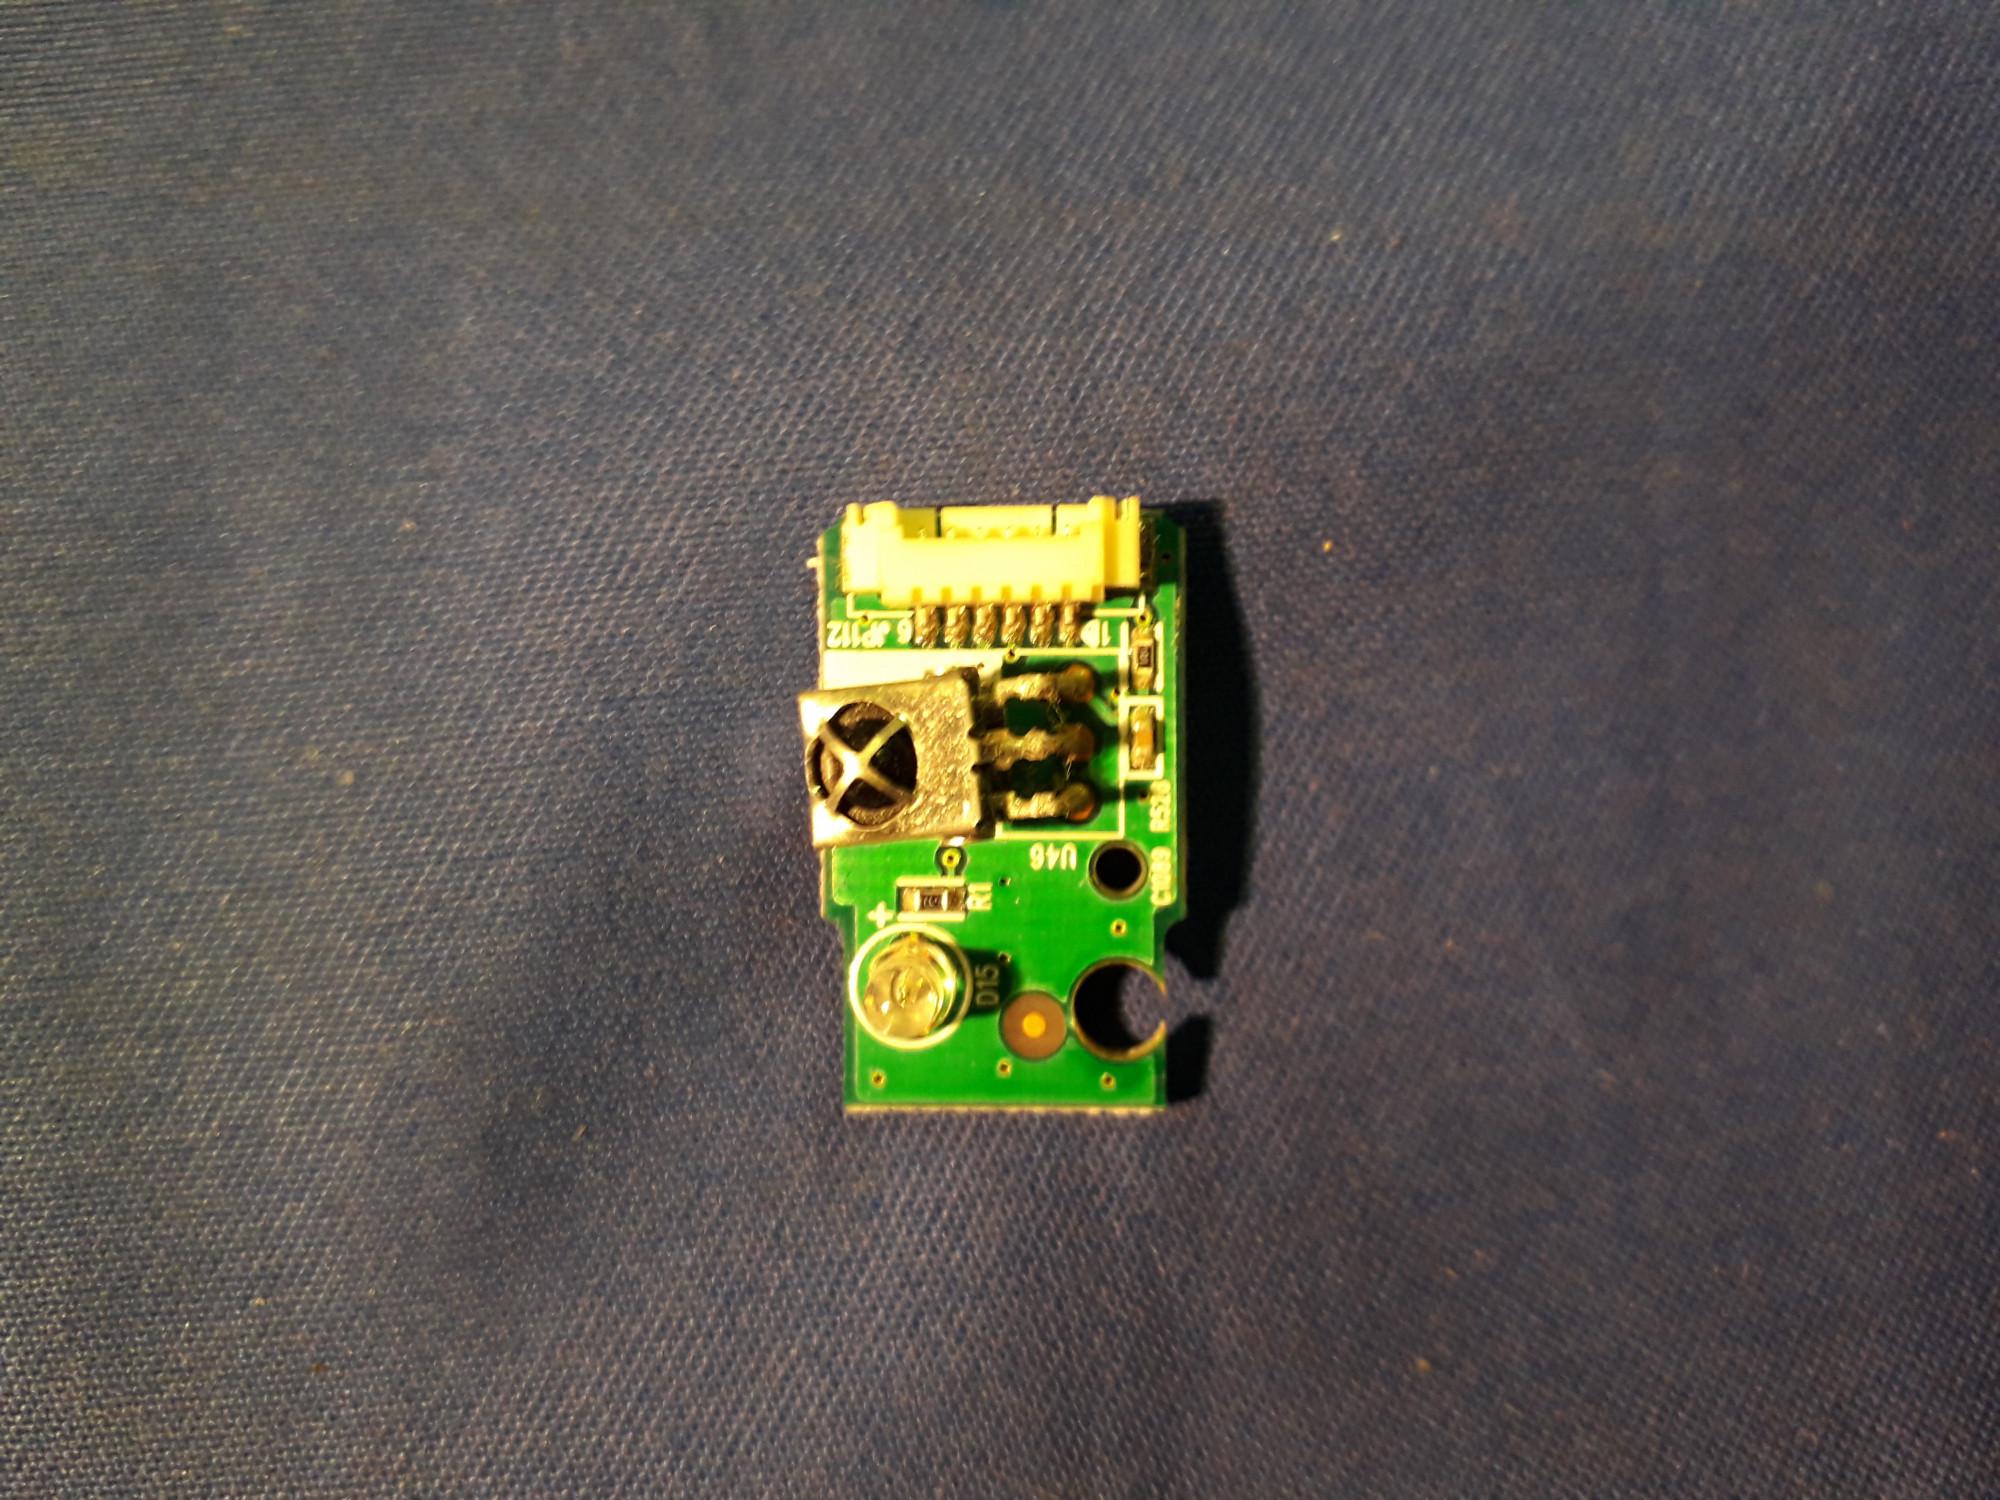 01004 4860 Ir Remote Control Sensor For Humax Lu23 Td1 Eus1 Gb Checking